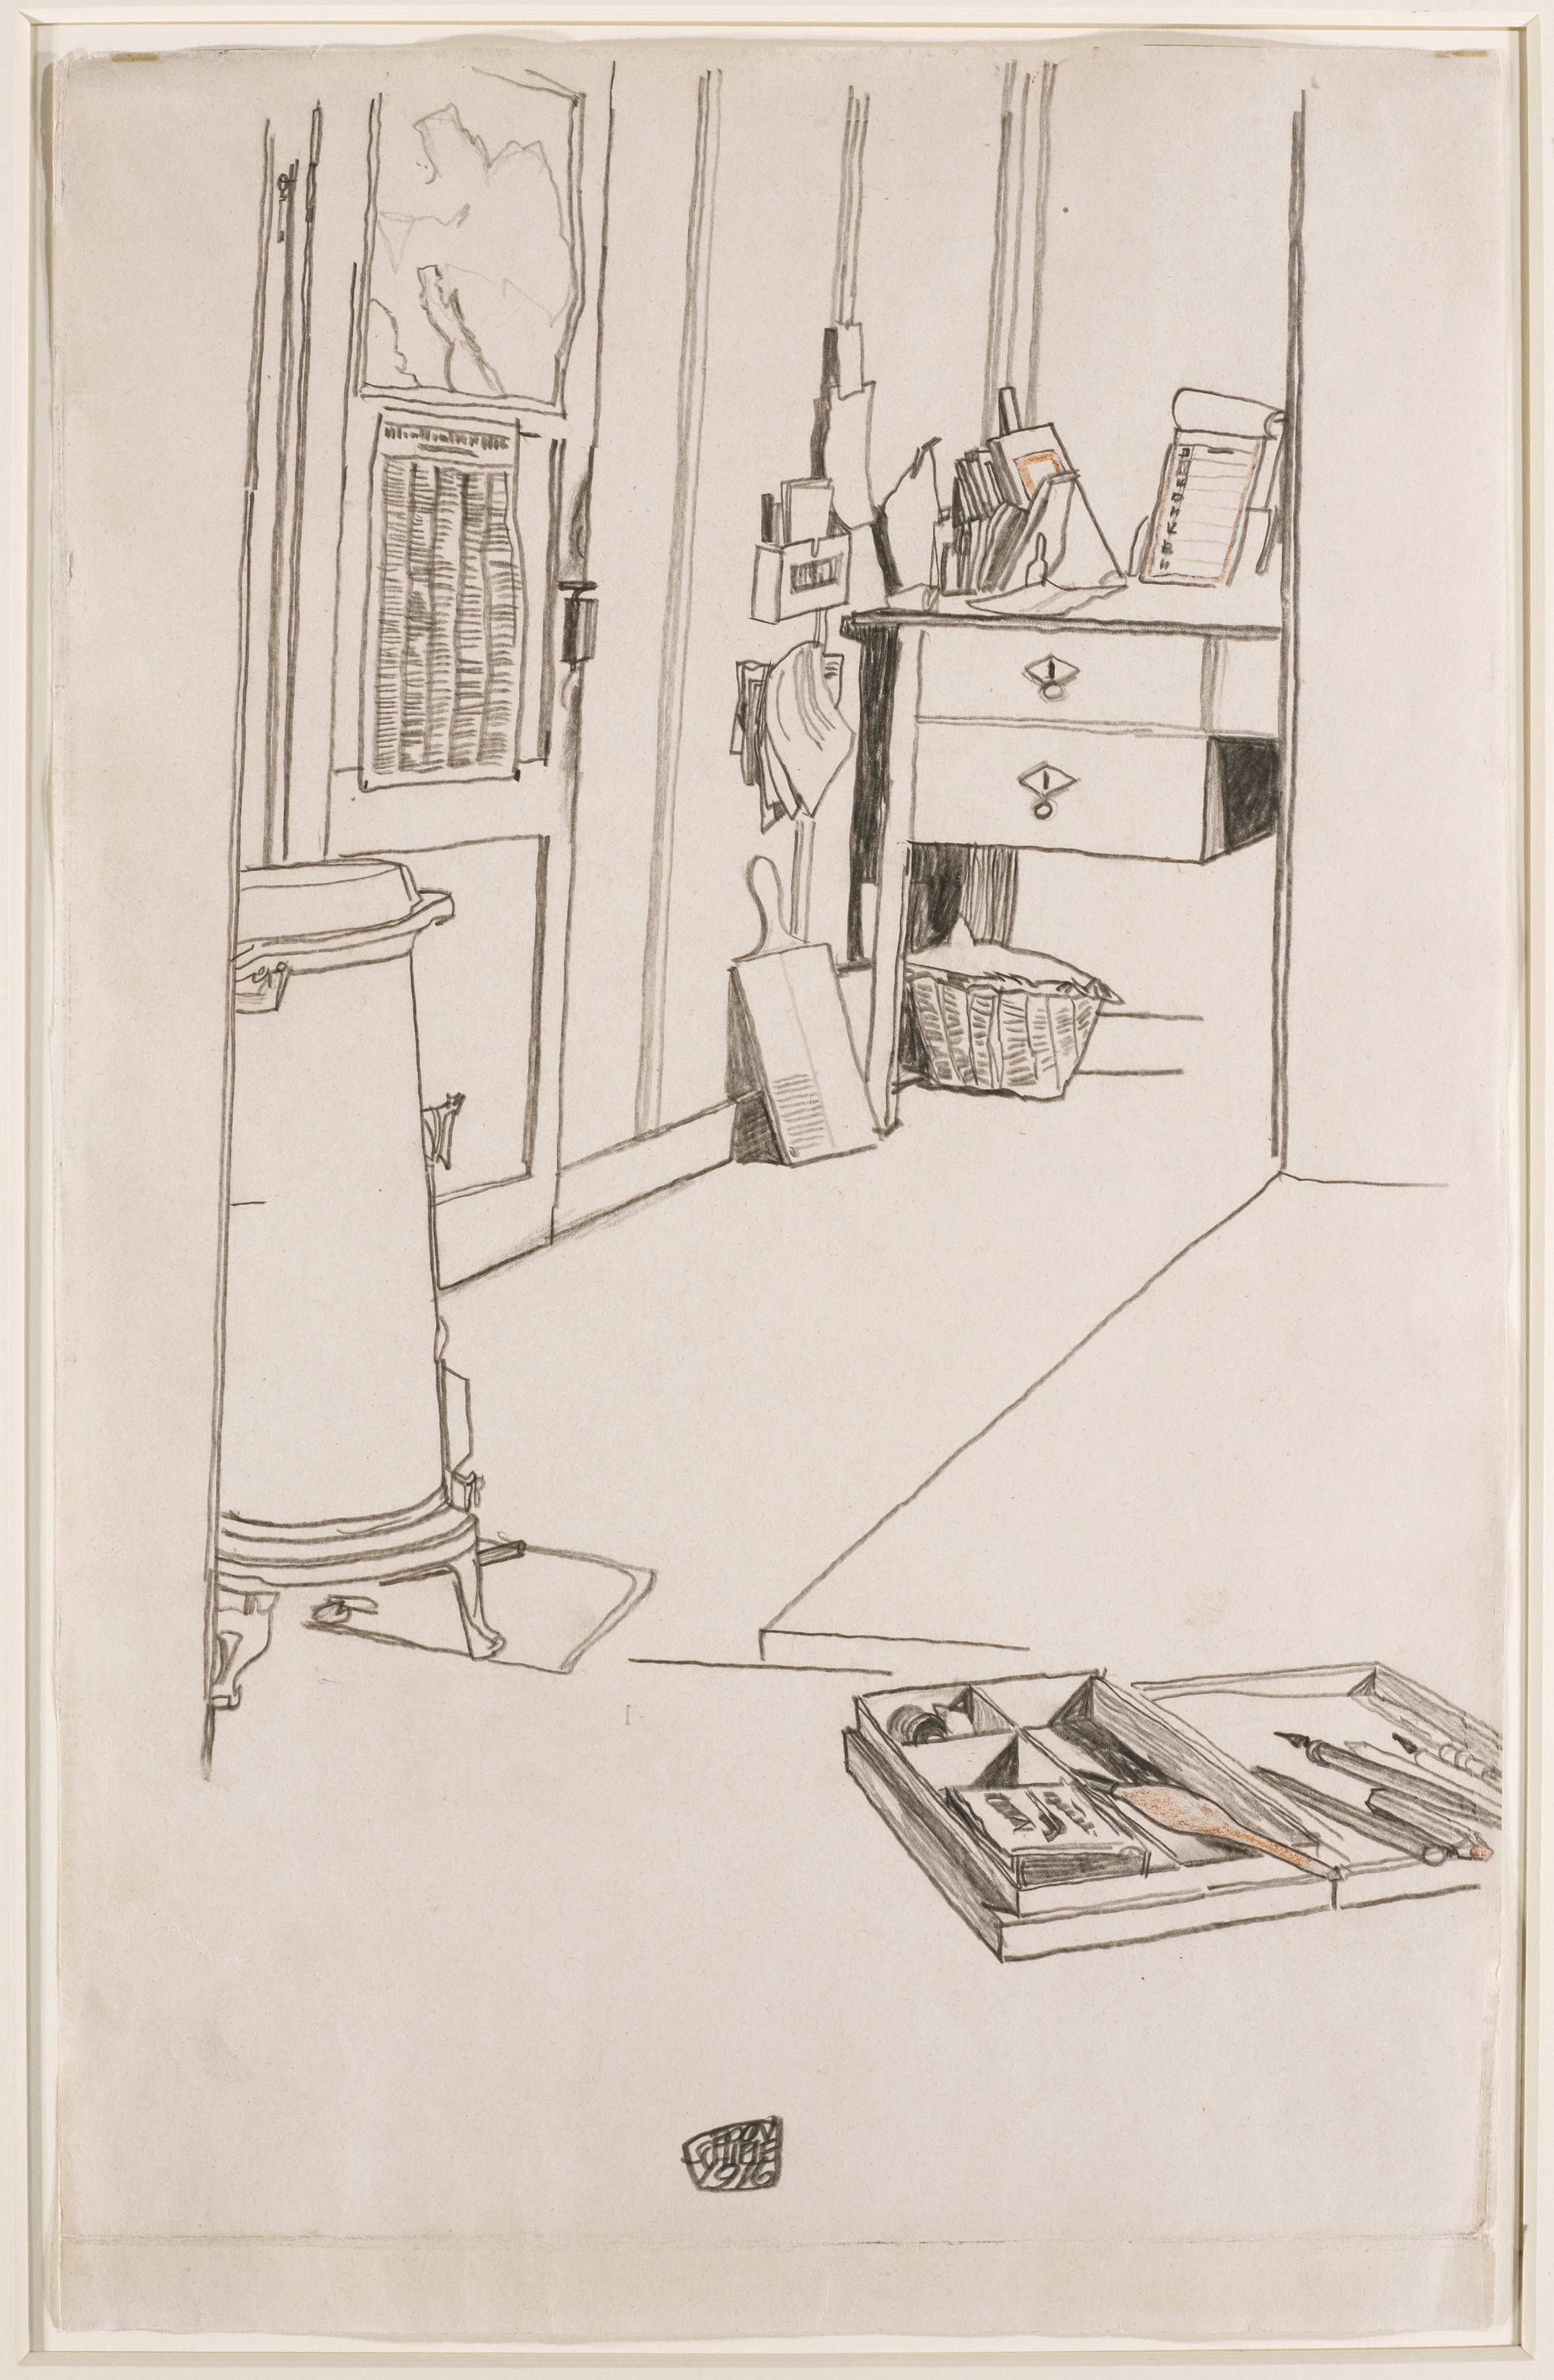 Katrin Bellinger Collection, inv. no. 2013-031